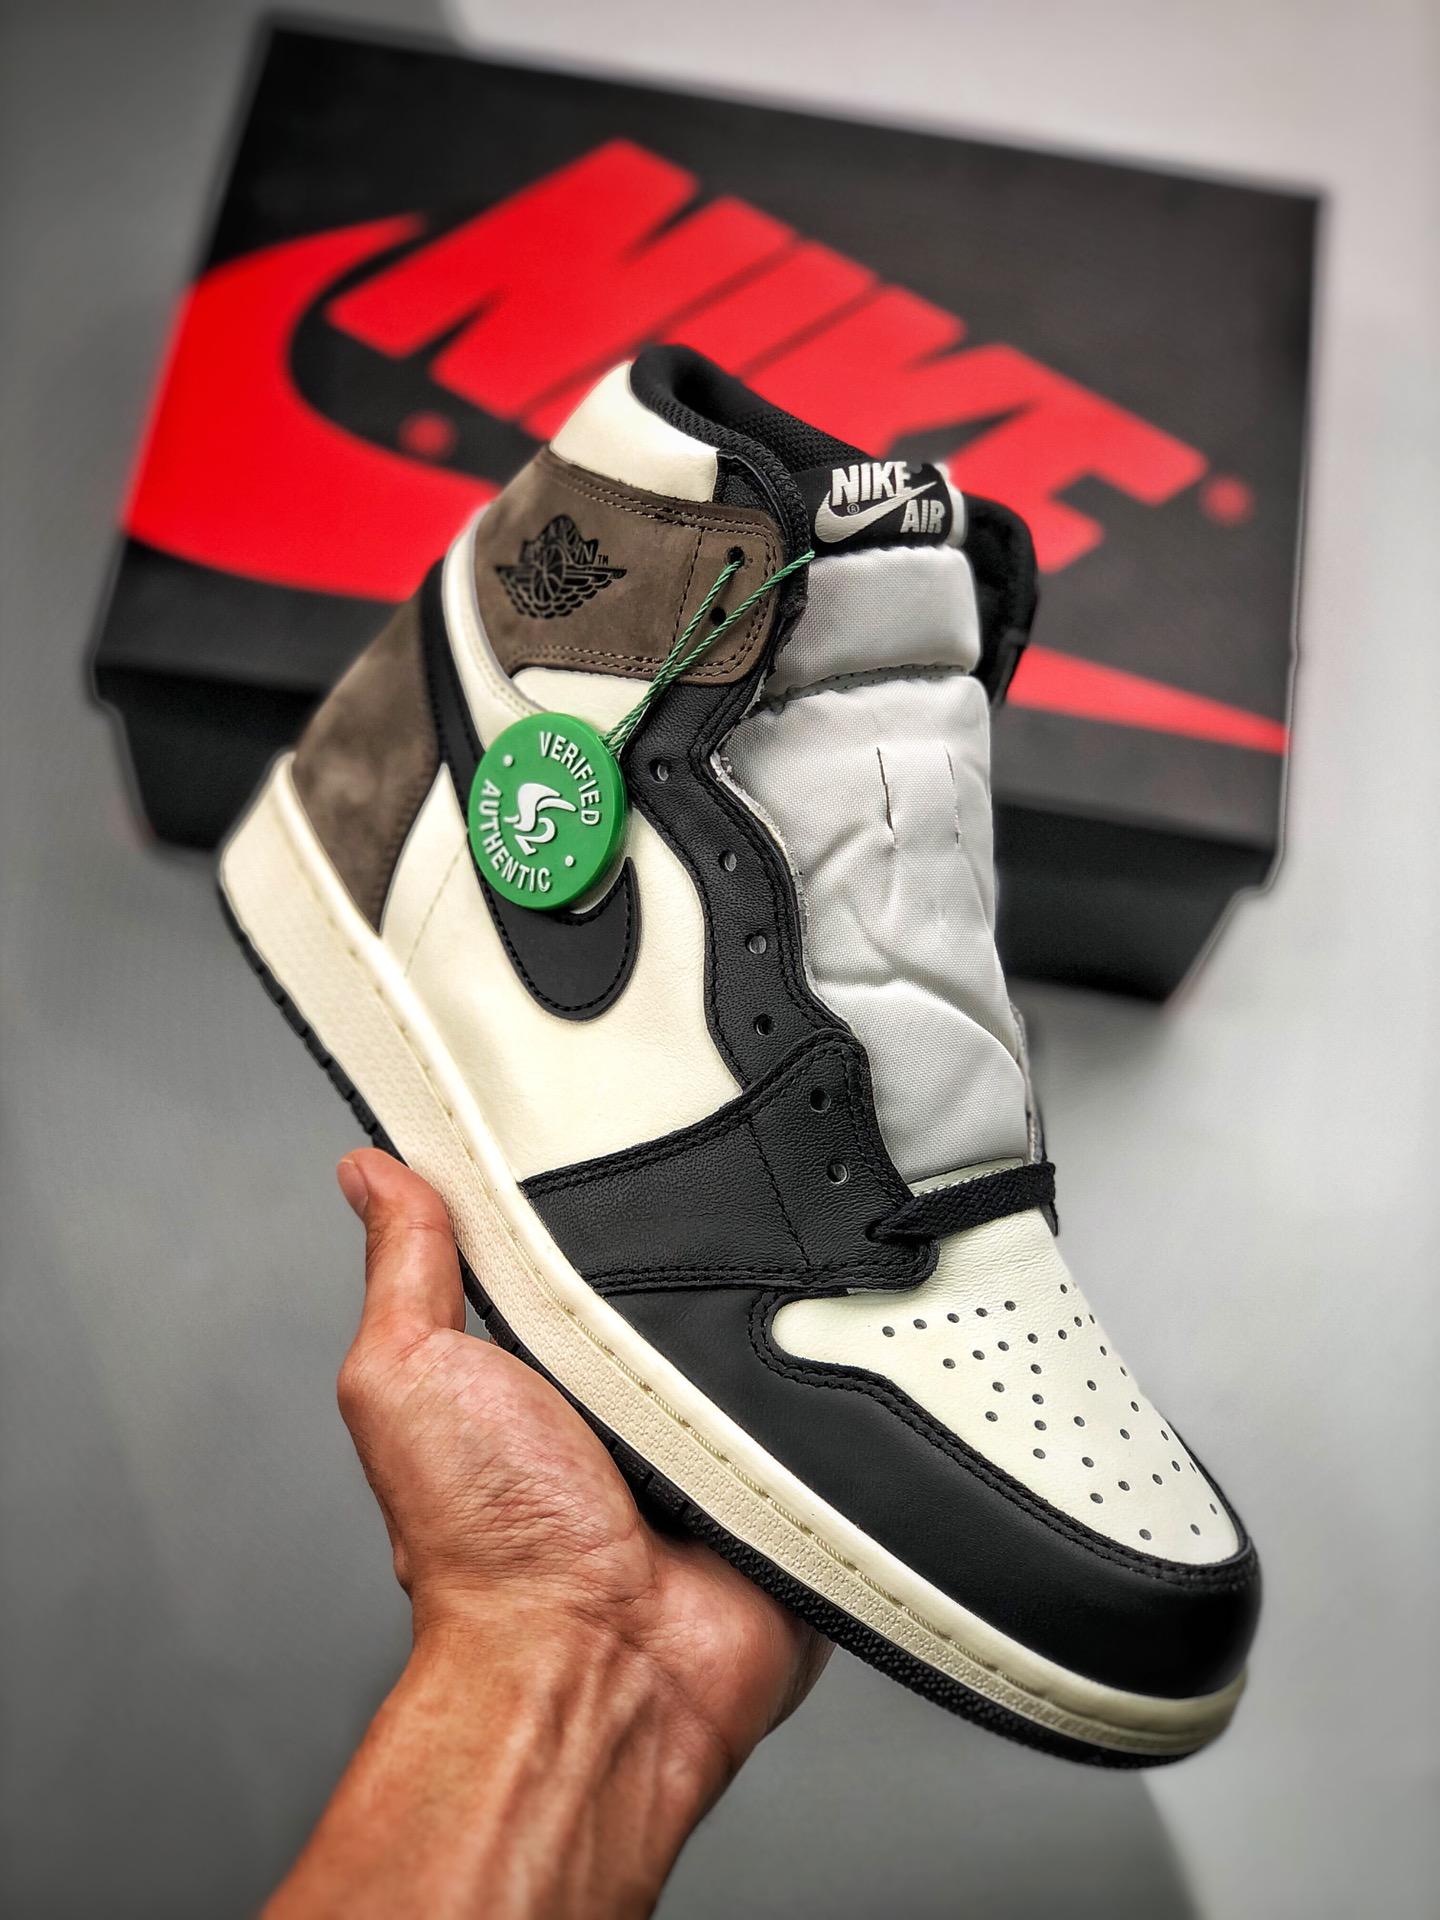 "Air Jordan 1 Retro ""Dark Mocha"" 小倒钩/摩卡咖啡色 货号:555088-105_s2纯原椰子500"